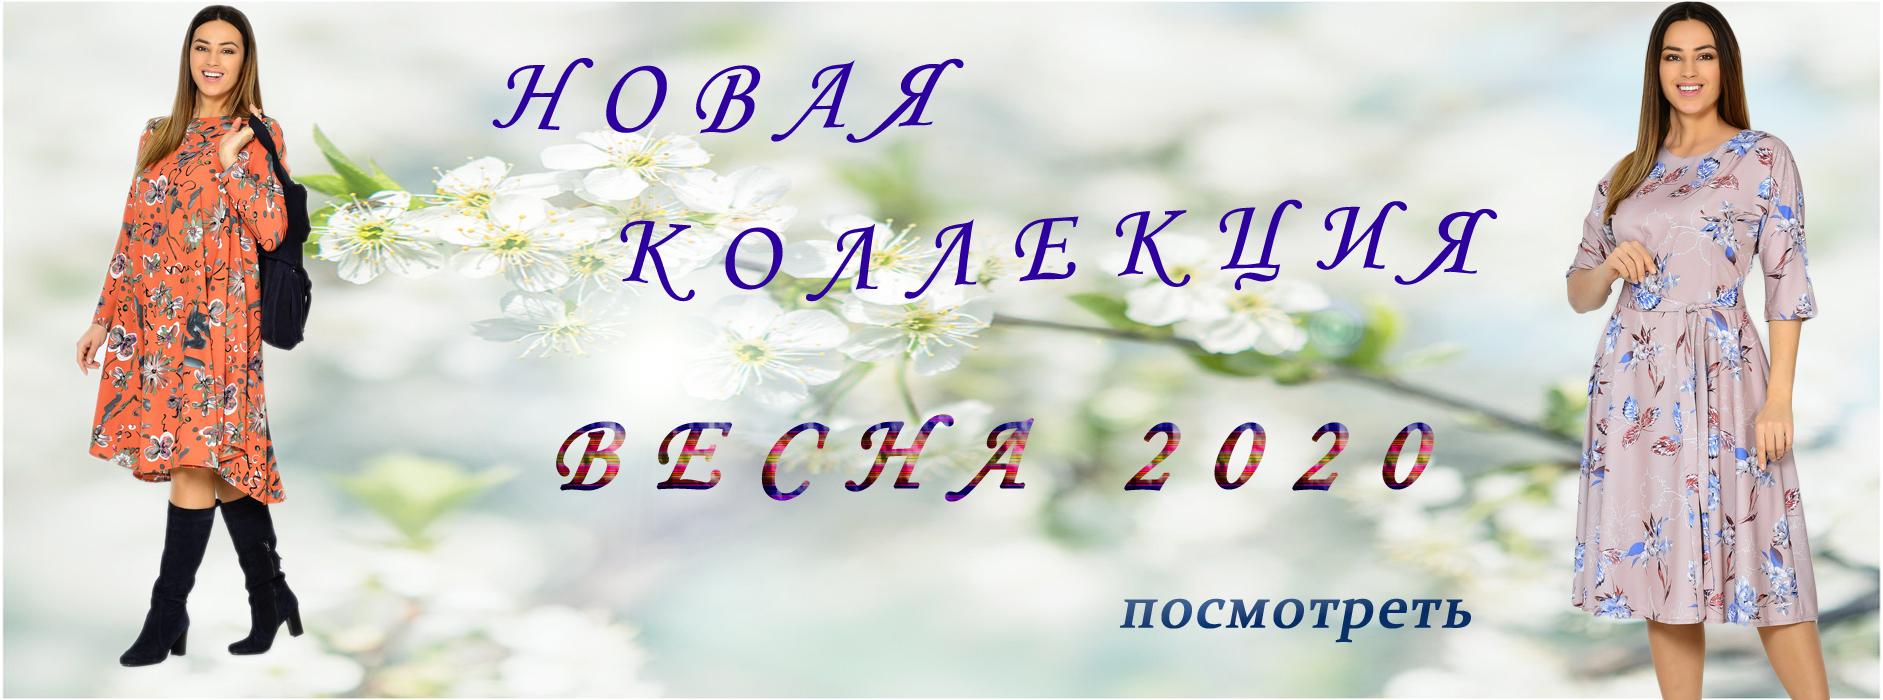 Коллекция Весна 2020